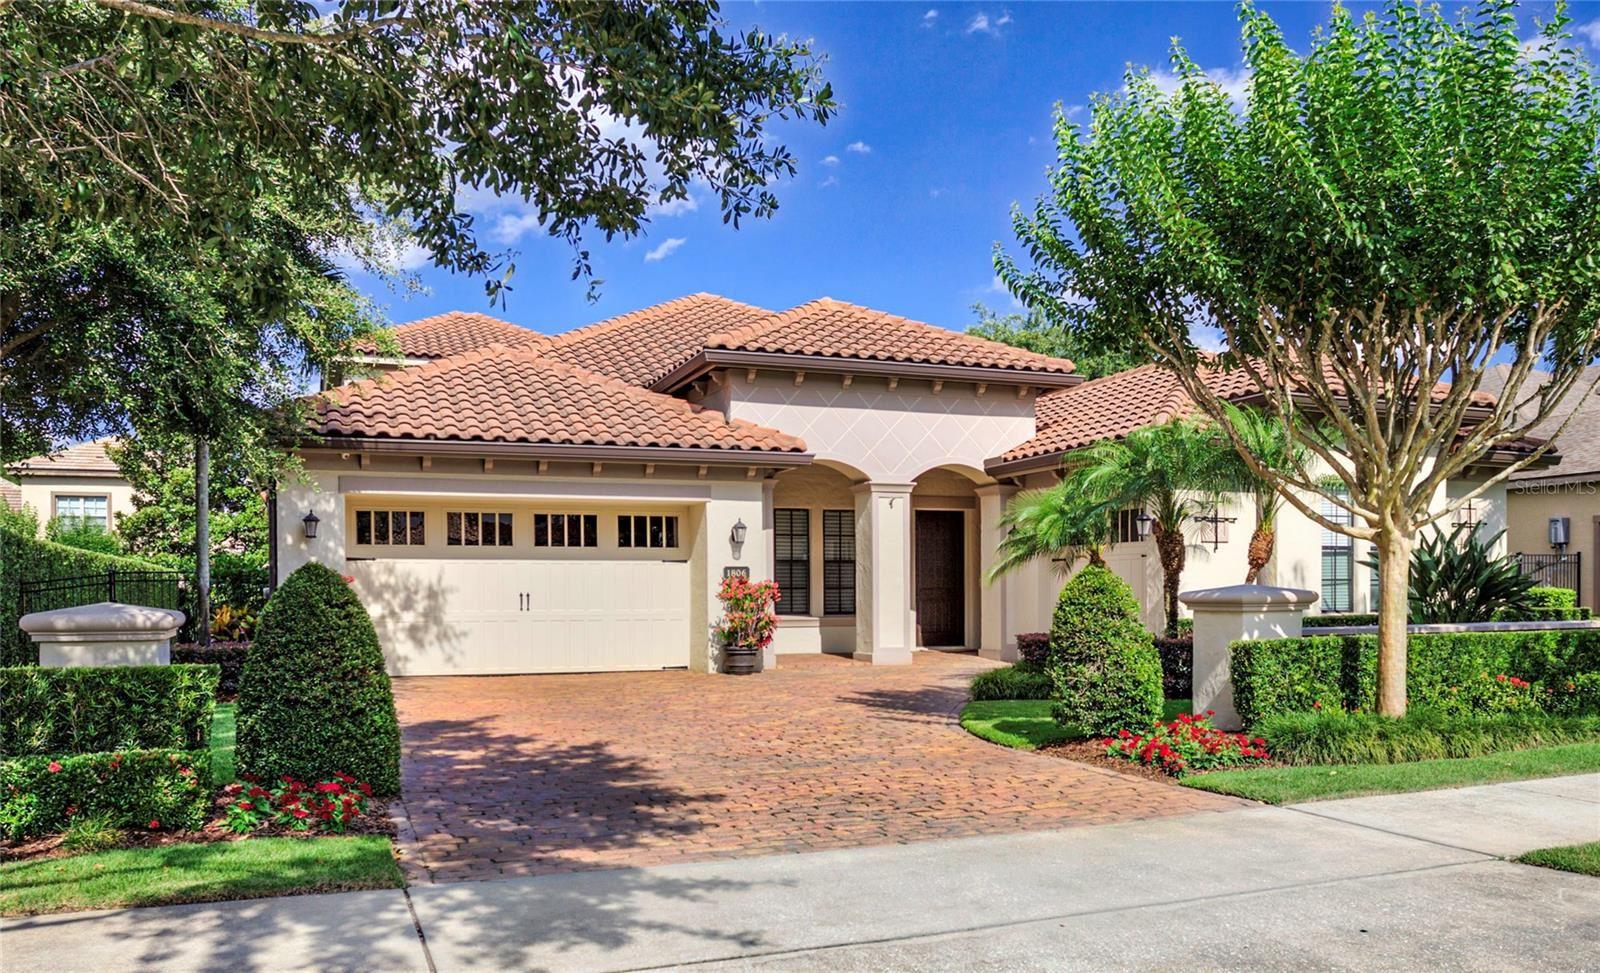 1806 LAURELTON HALL LANE, Winter Park, FL 32789 - #: O5950597